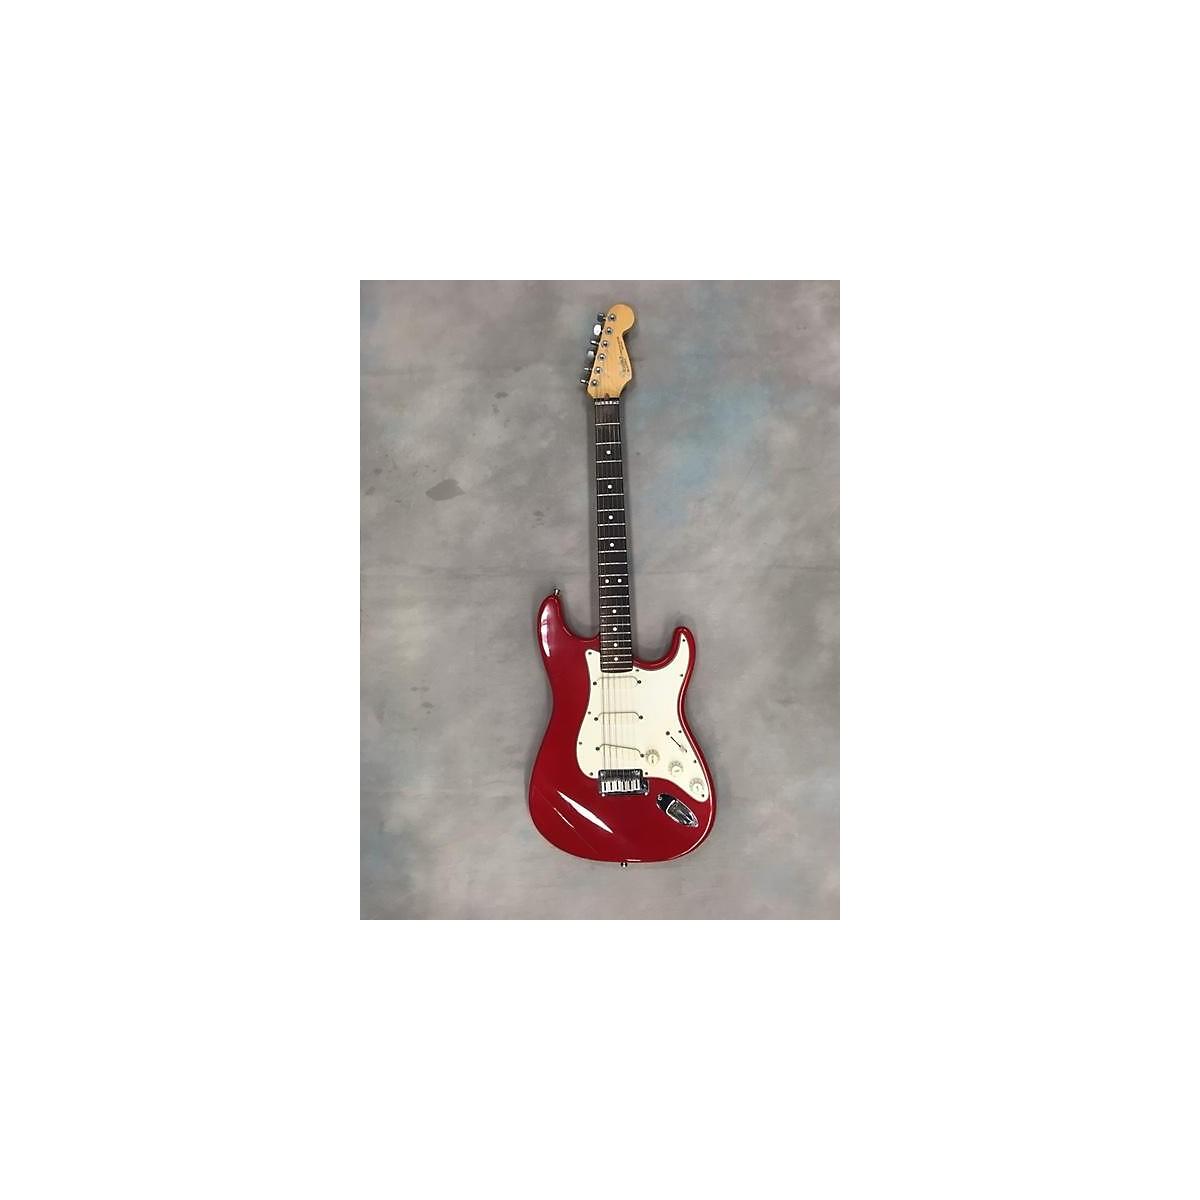 Fender 1993 Strat Plus Solid Body Electric Guitar